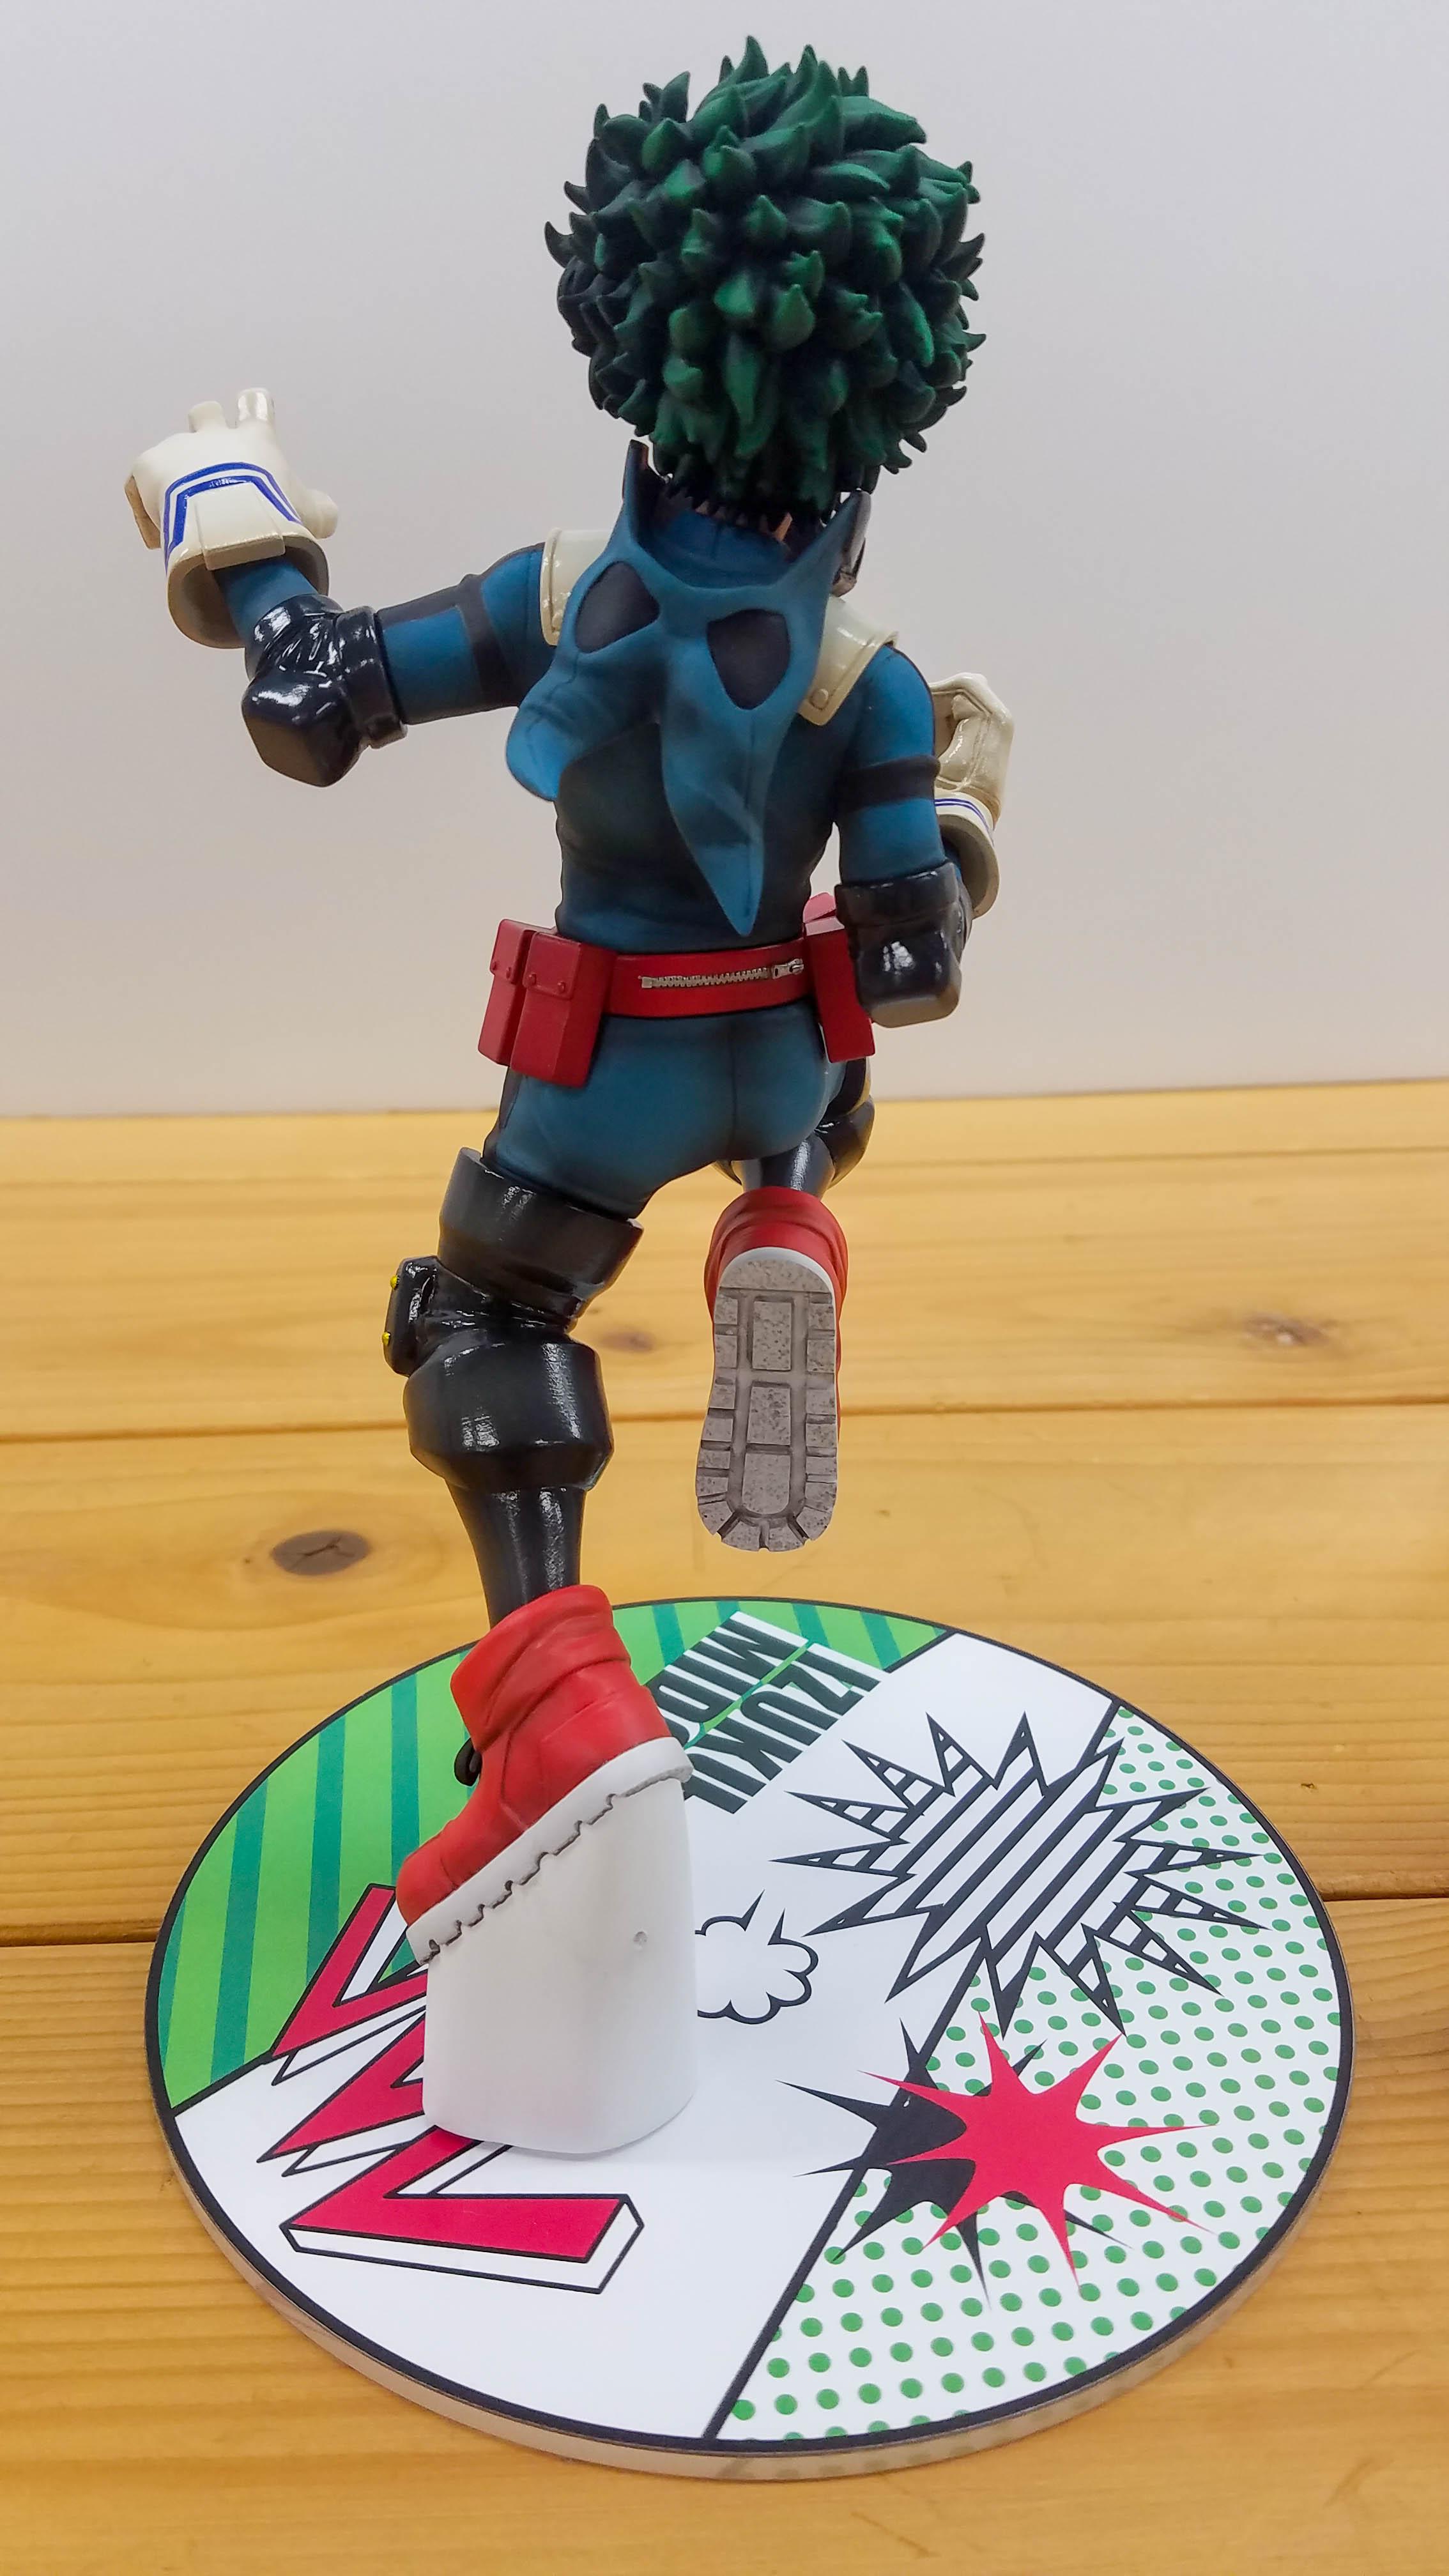 My Hero Academia Izuku Midoriya by Chara-Ani